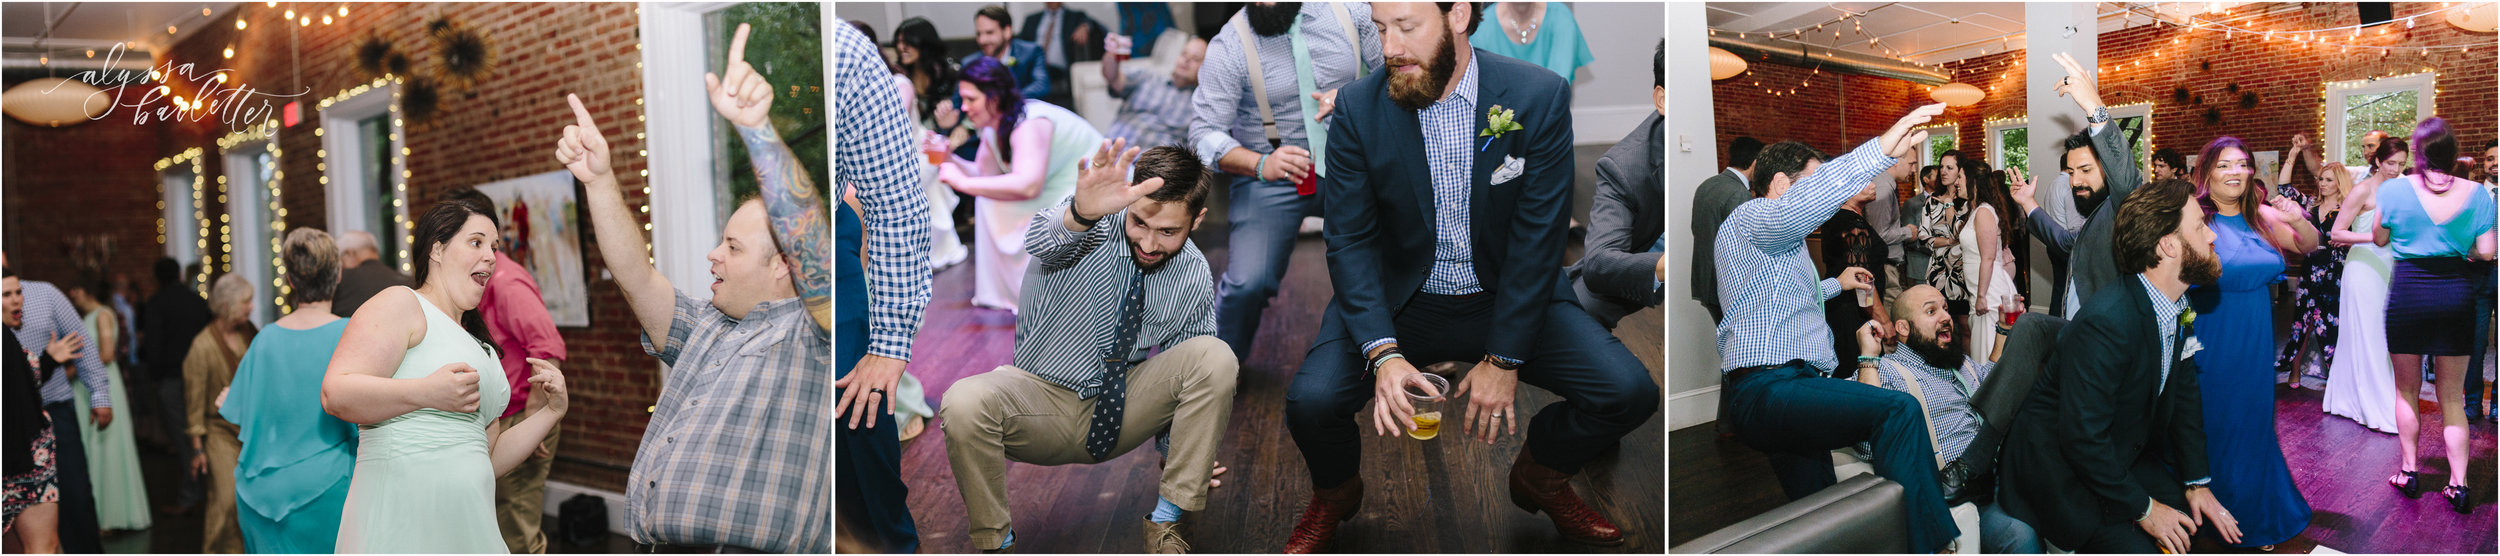 alyssa barletter photography kansas city wedding 2016 main courtney and brian-1-52.jpg